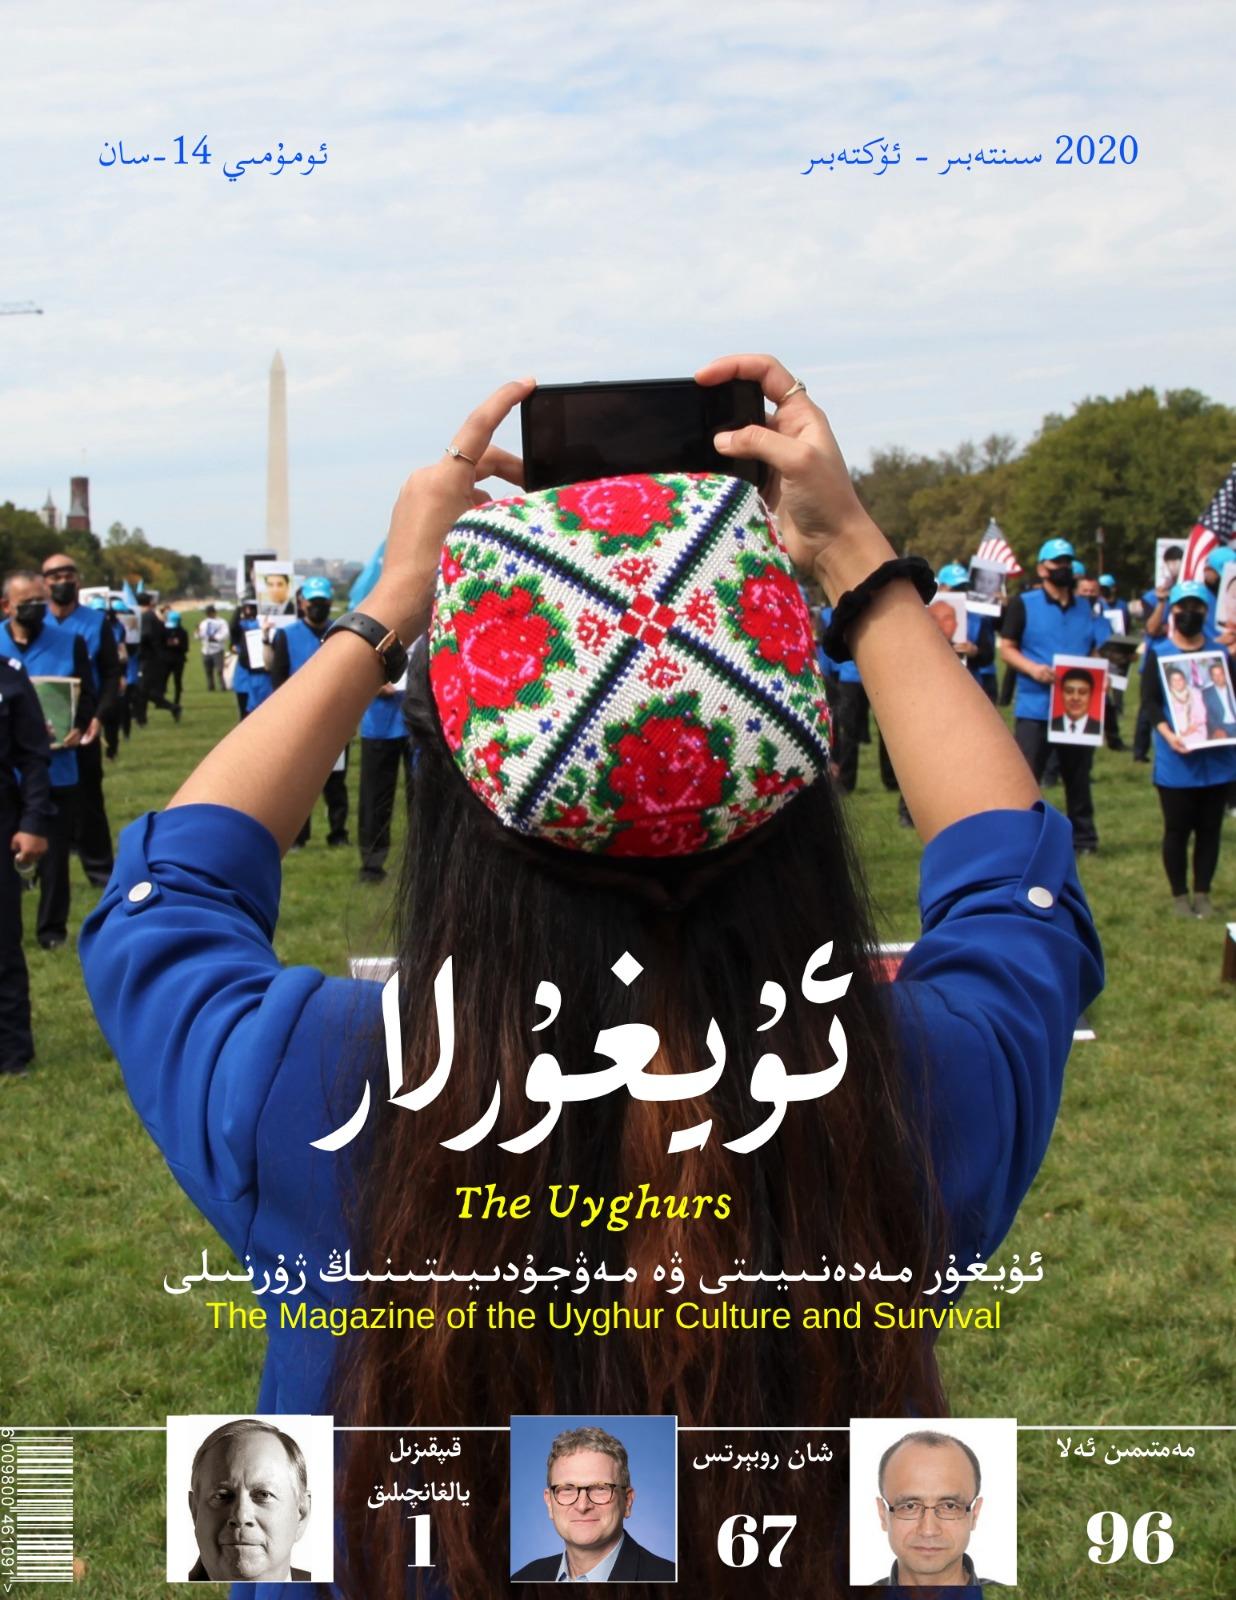 uyghur14 - ئۇيغۇرلار 2020-يىلى 14-سان